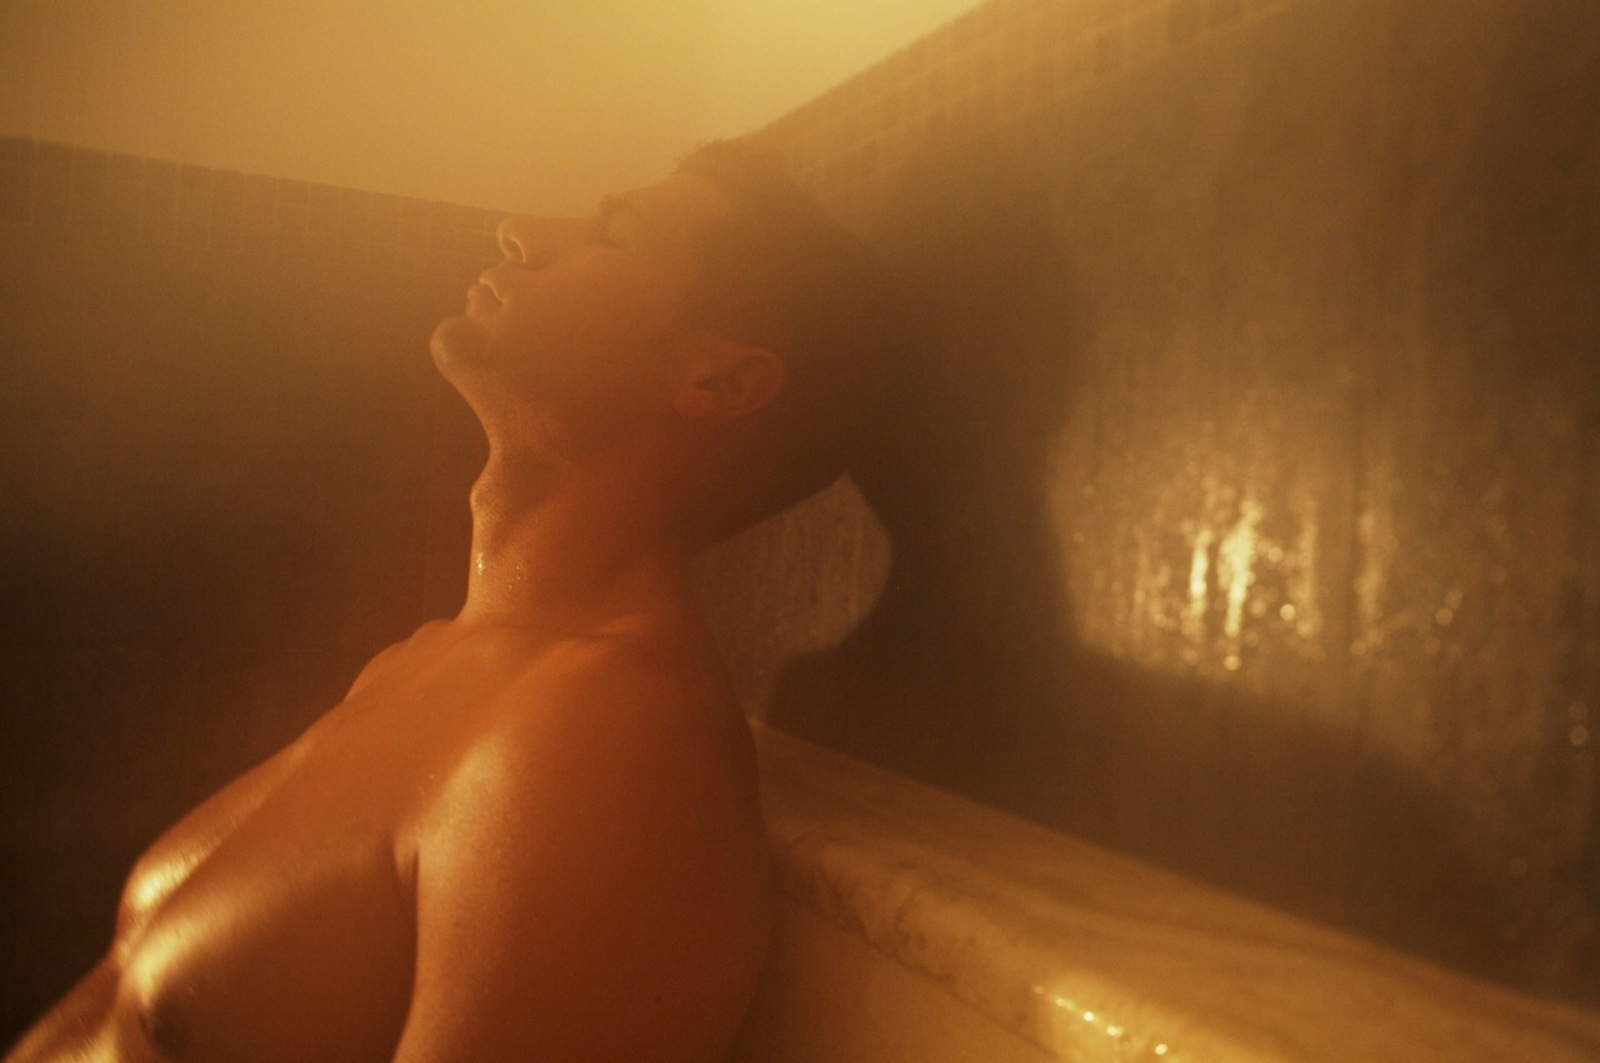 Benefits of Steam Bathing